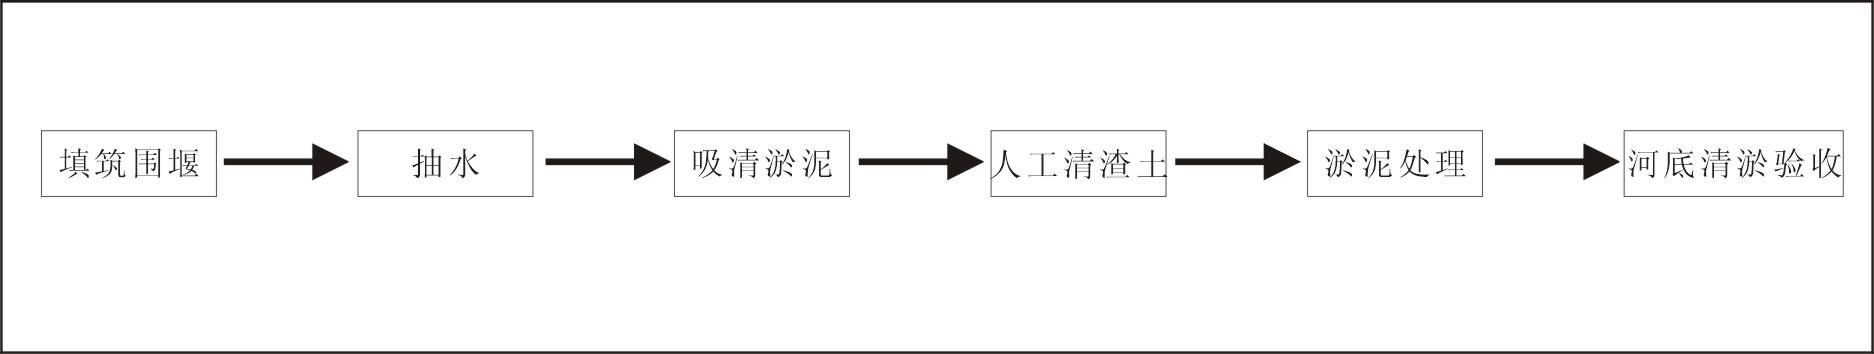 http://www.pqliuti.com/fuwu/fuwu0908.html